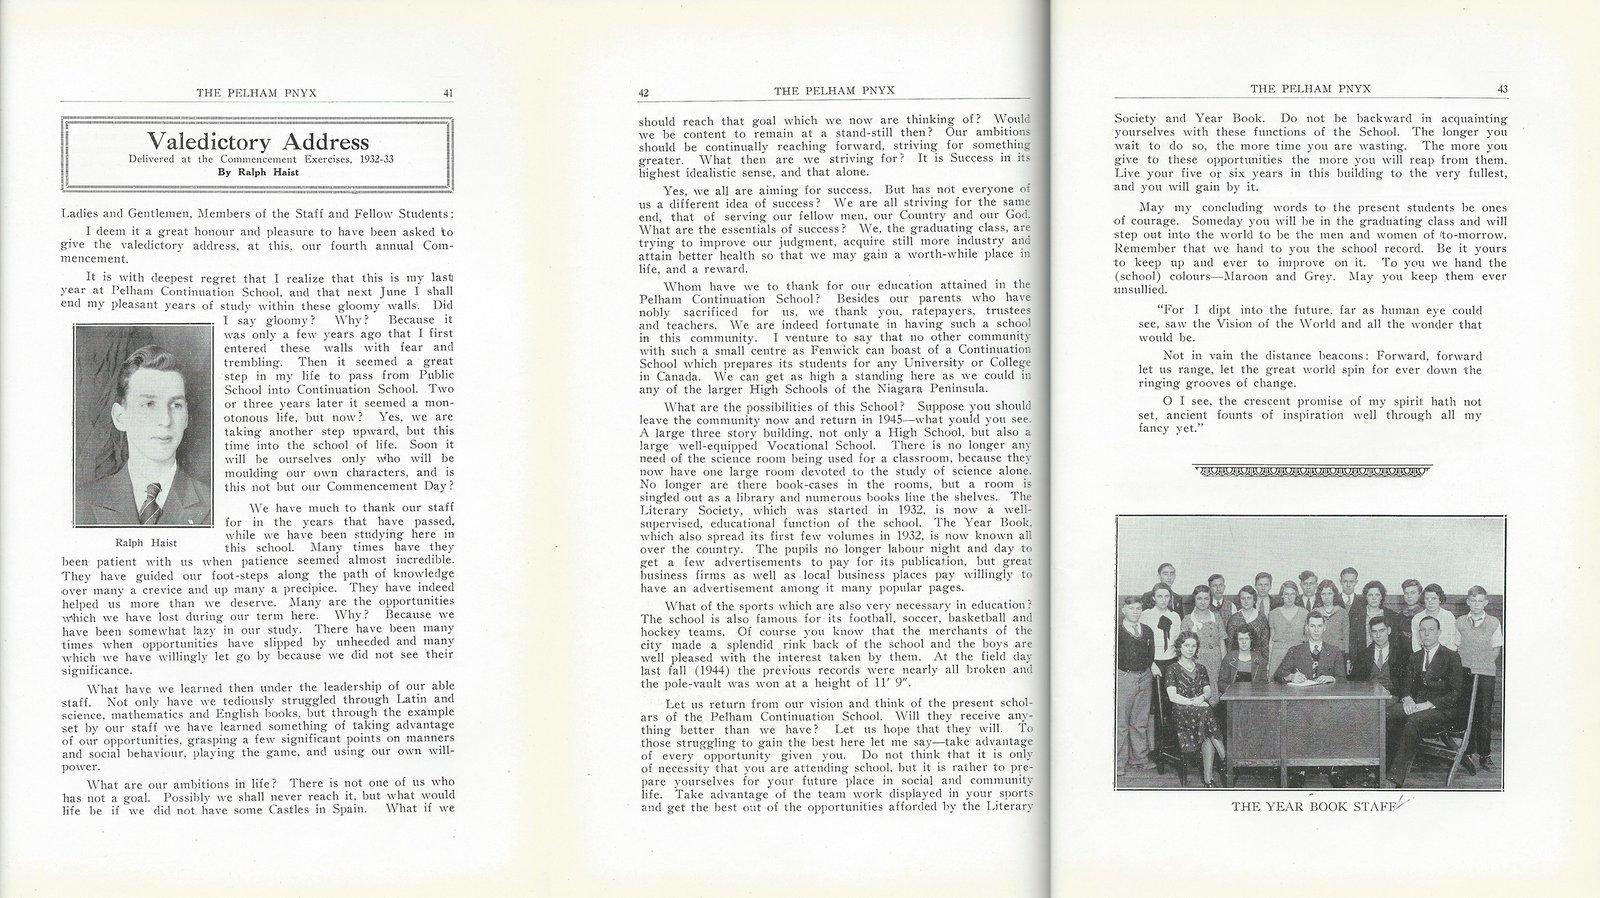 Pelham Pnyx 1933 - Valedictory Address